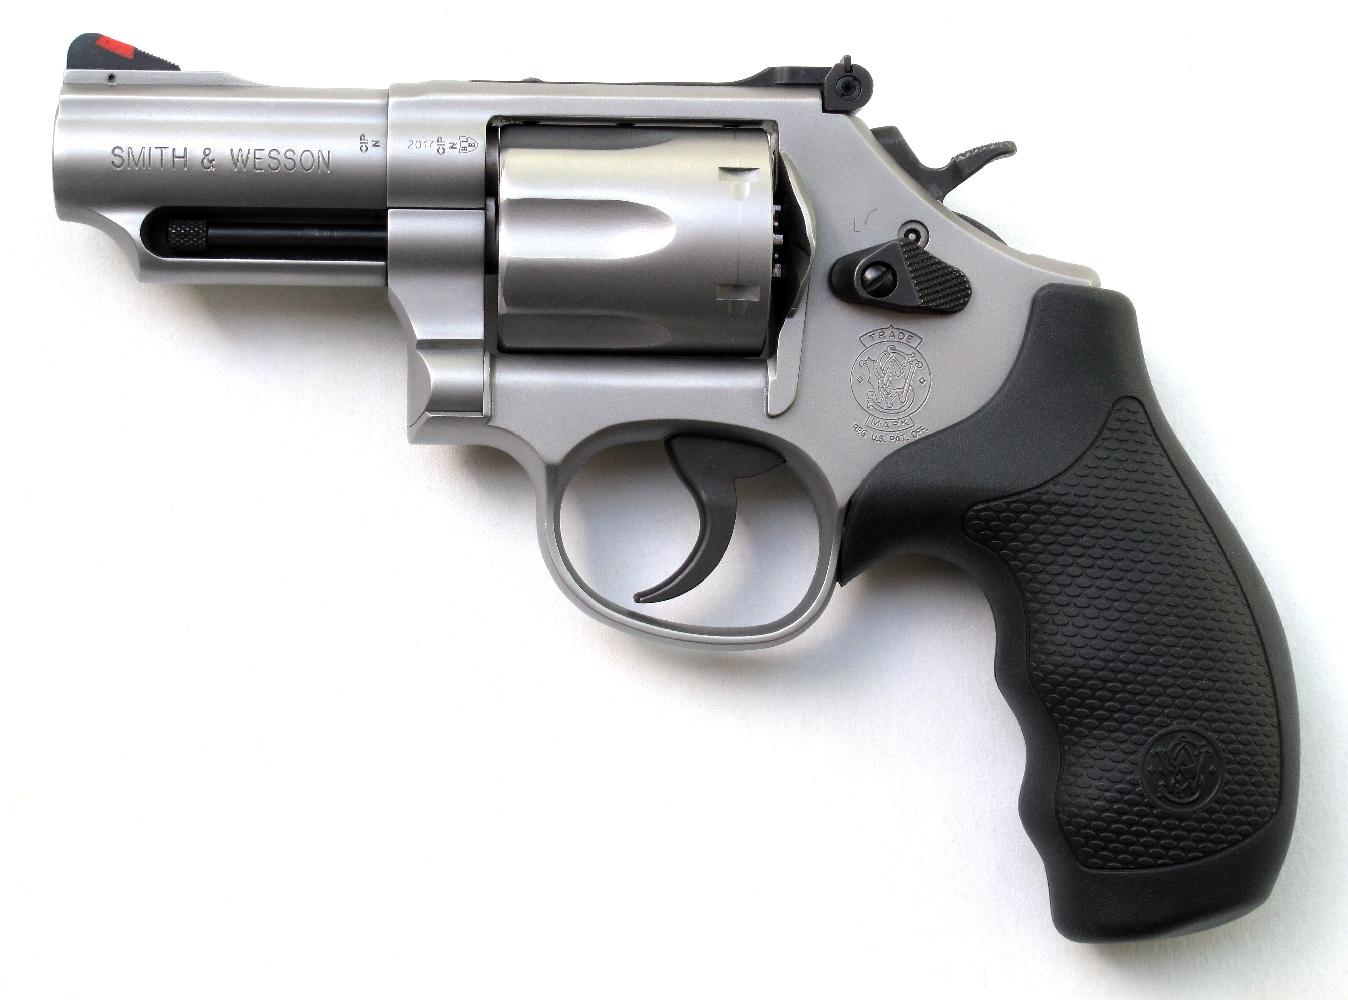 Revolver S&W modèle 66-8 « Combat Magnum » en calibre .357 Magnum